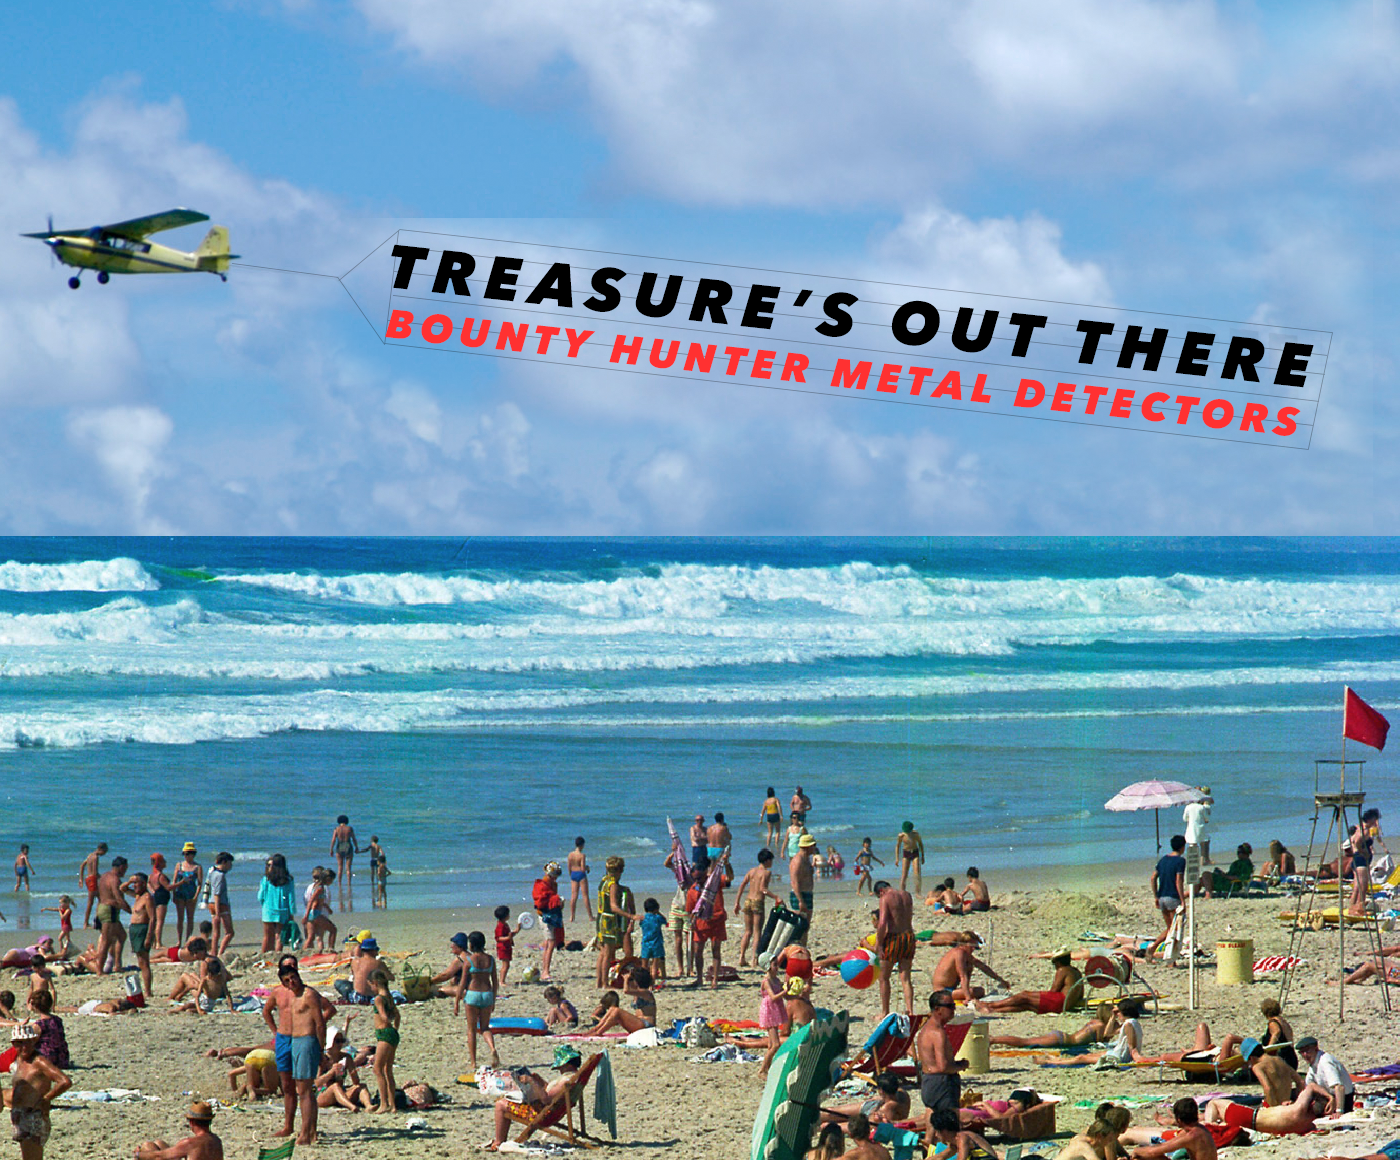 bounty hunter airplane 2.png